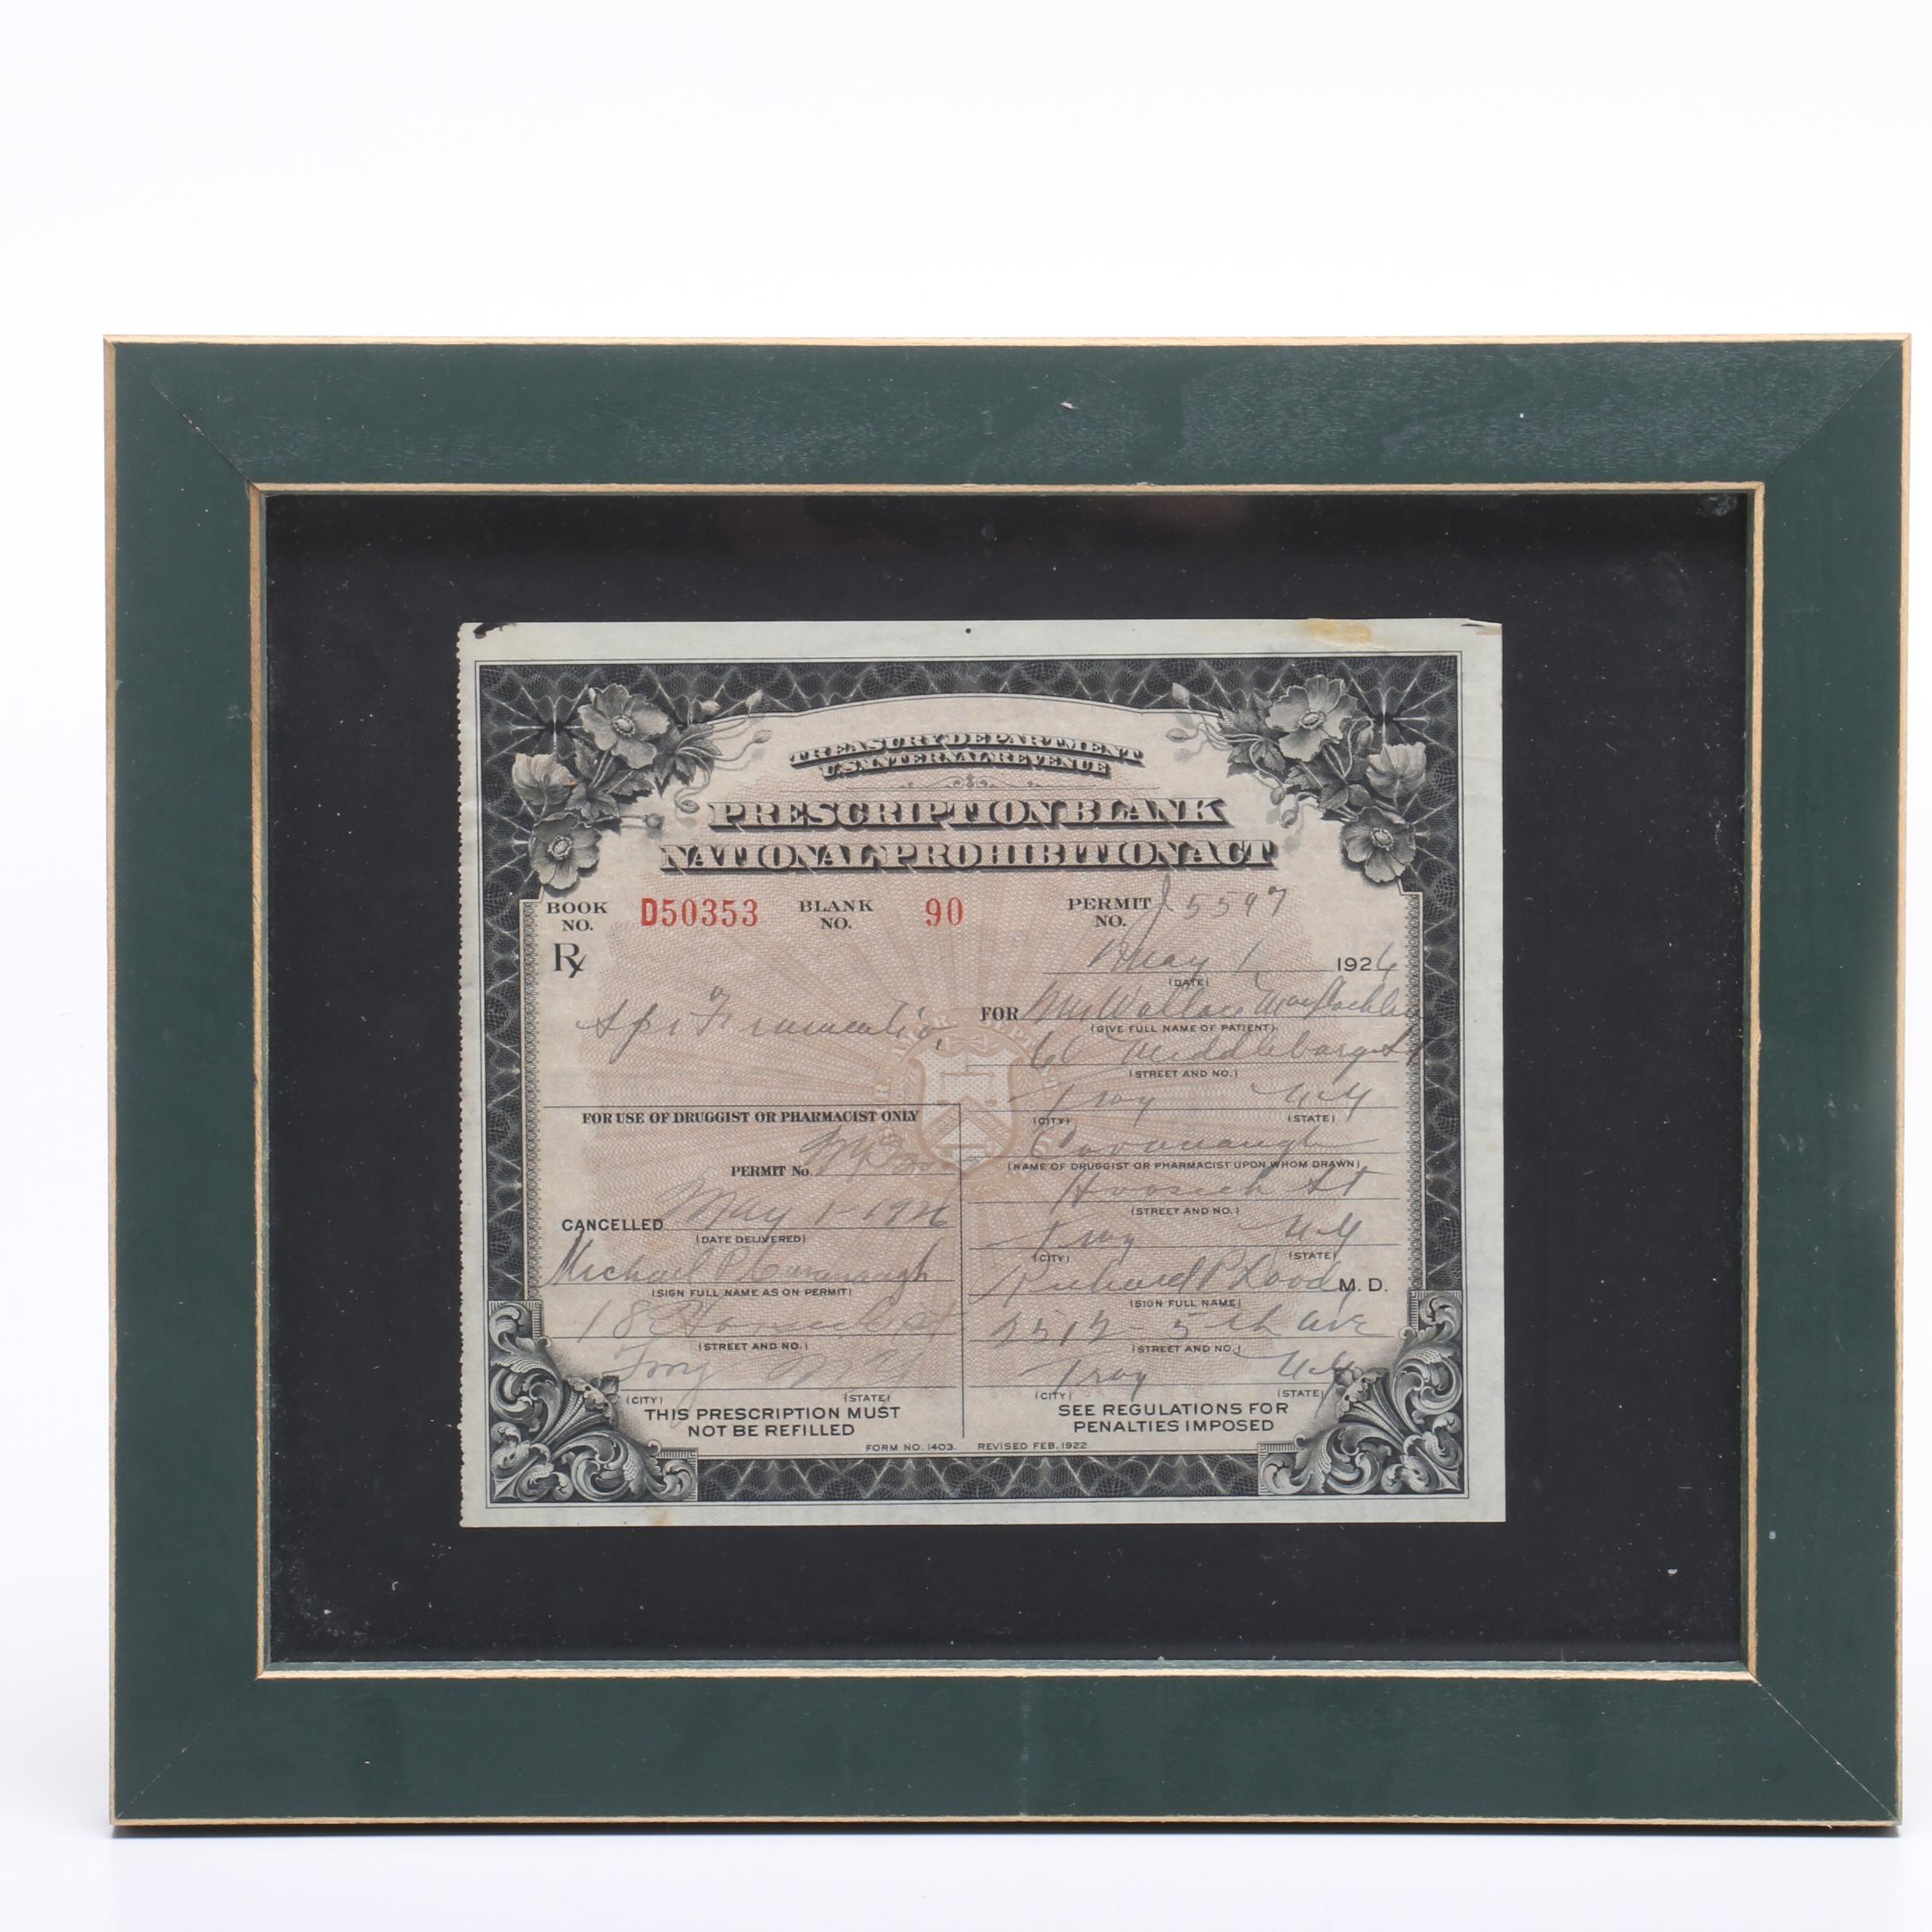 1926 Prohibition Era Whiskey Prescription from New York